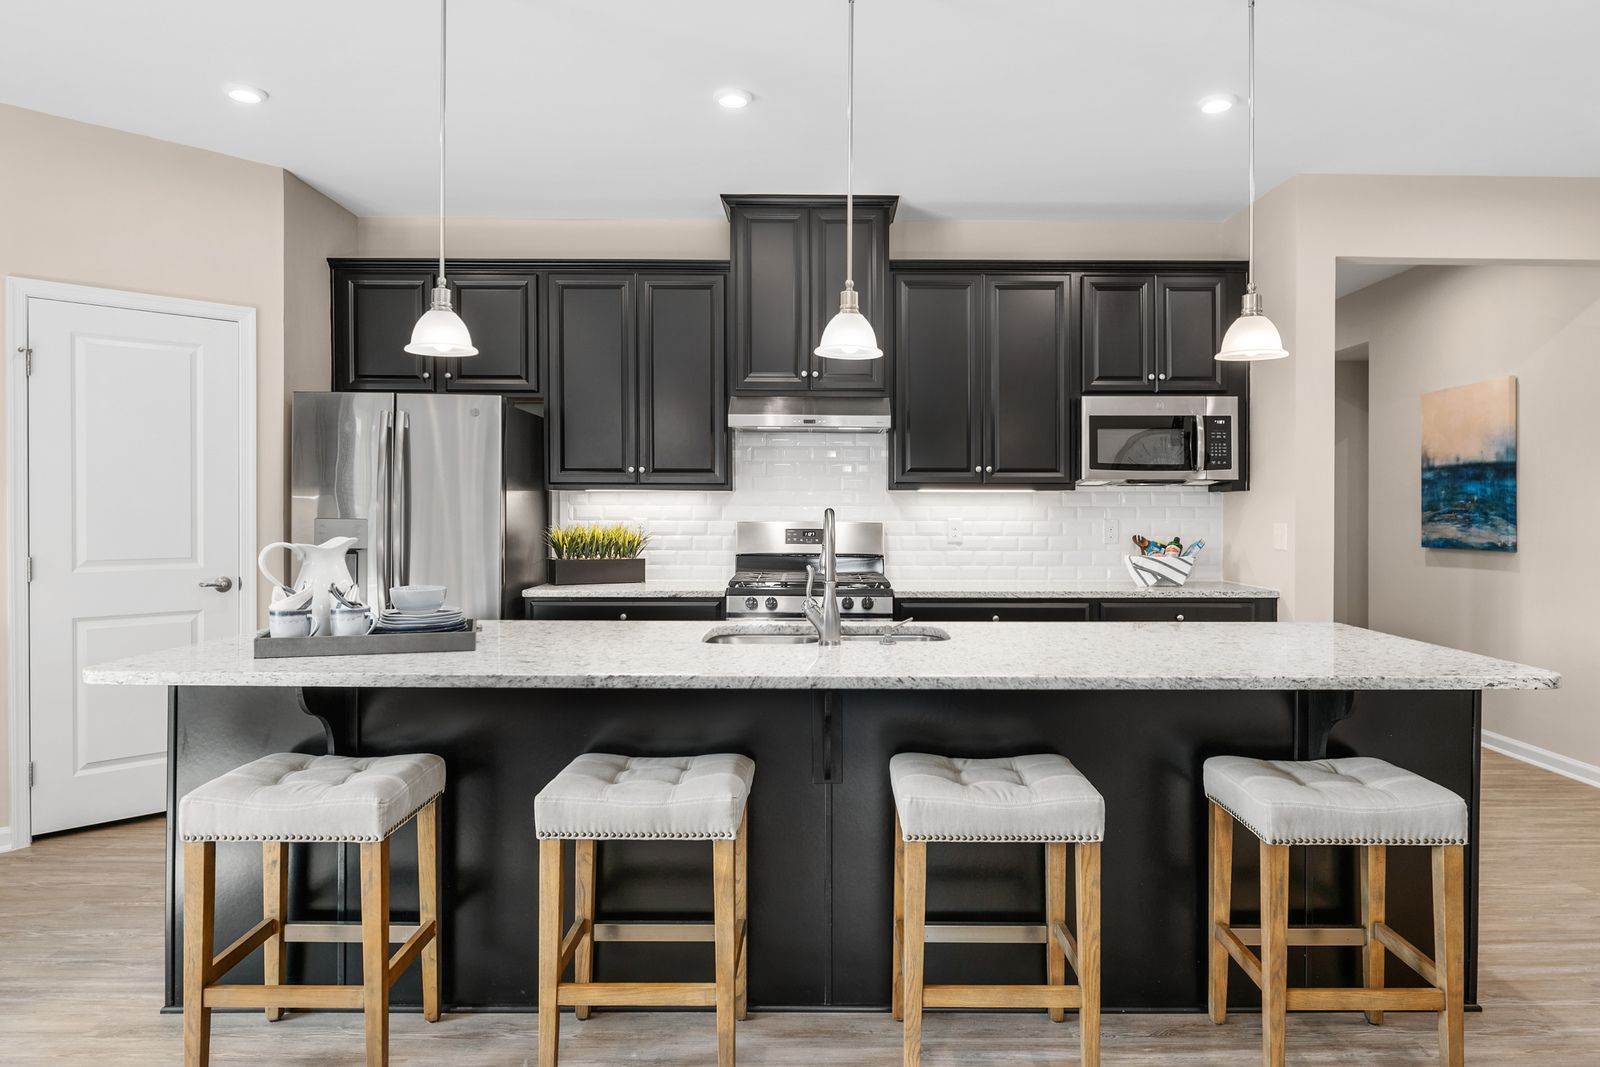 Kitchen featured in the Palladio By Ryan Homes in Greenville-Spartanburg, SC